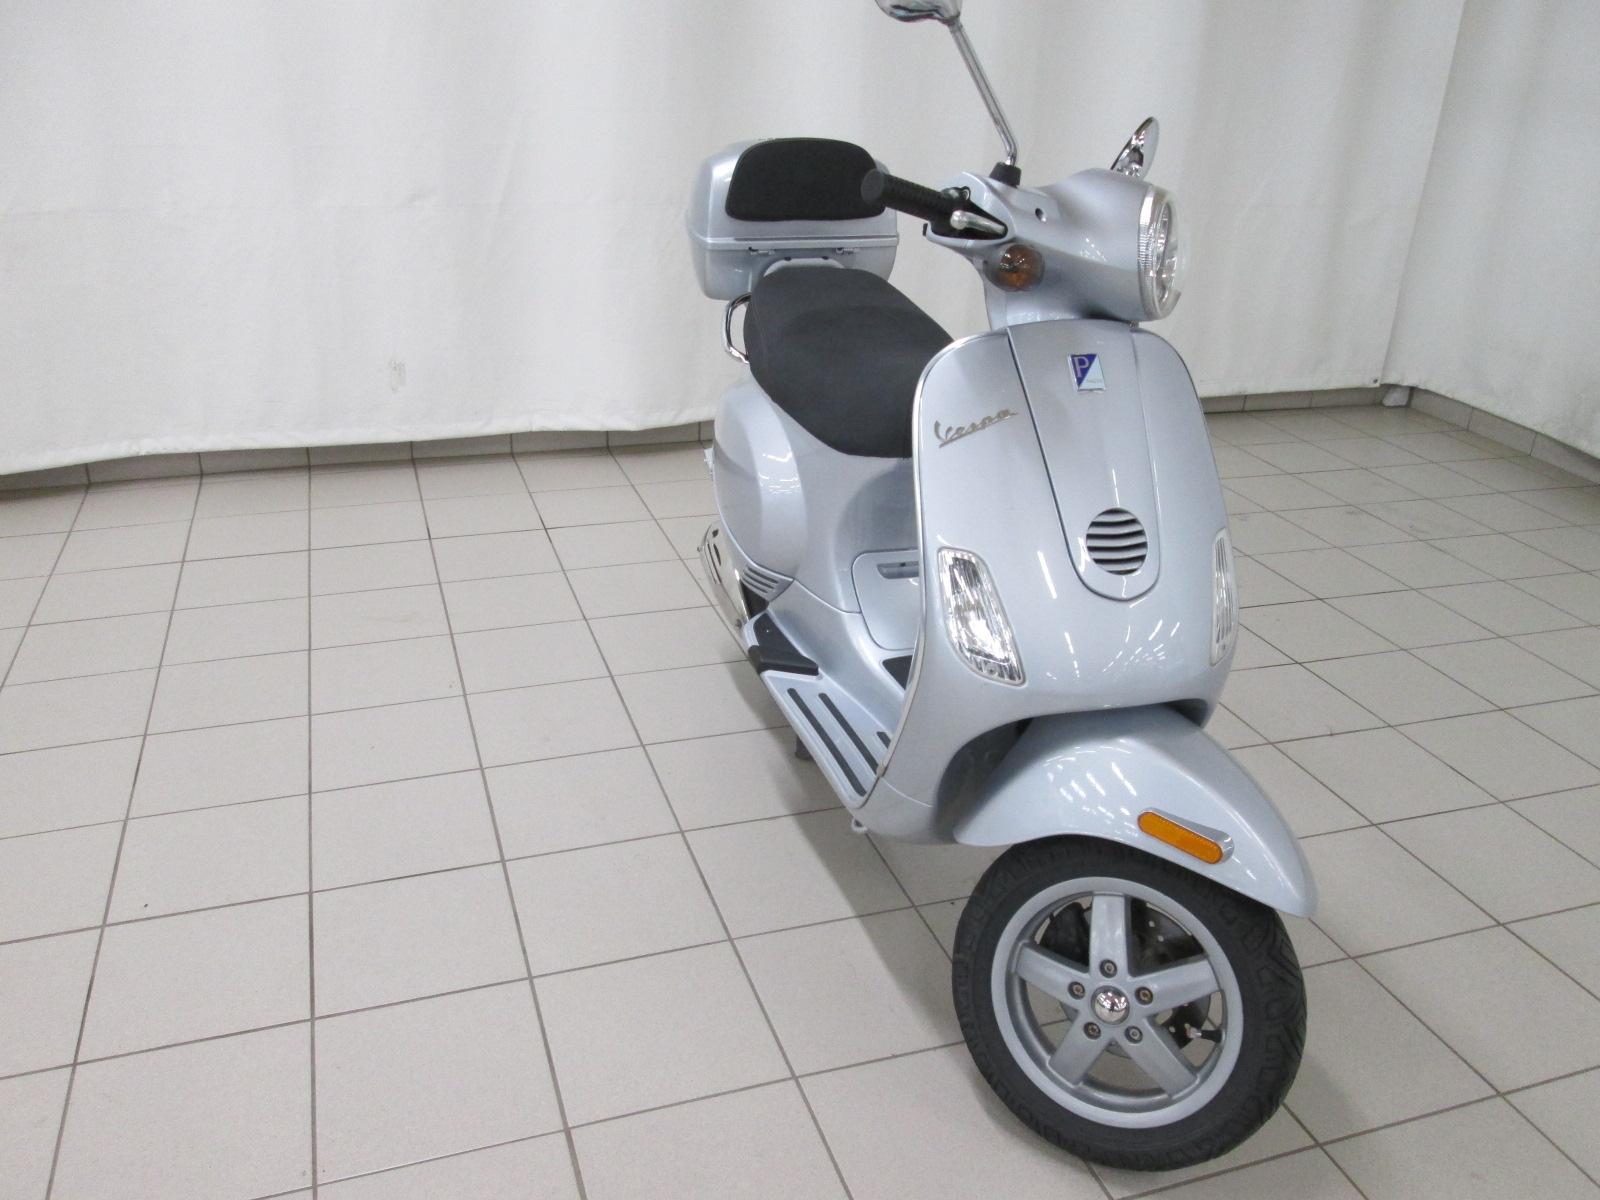 2007 VESPA LX50